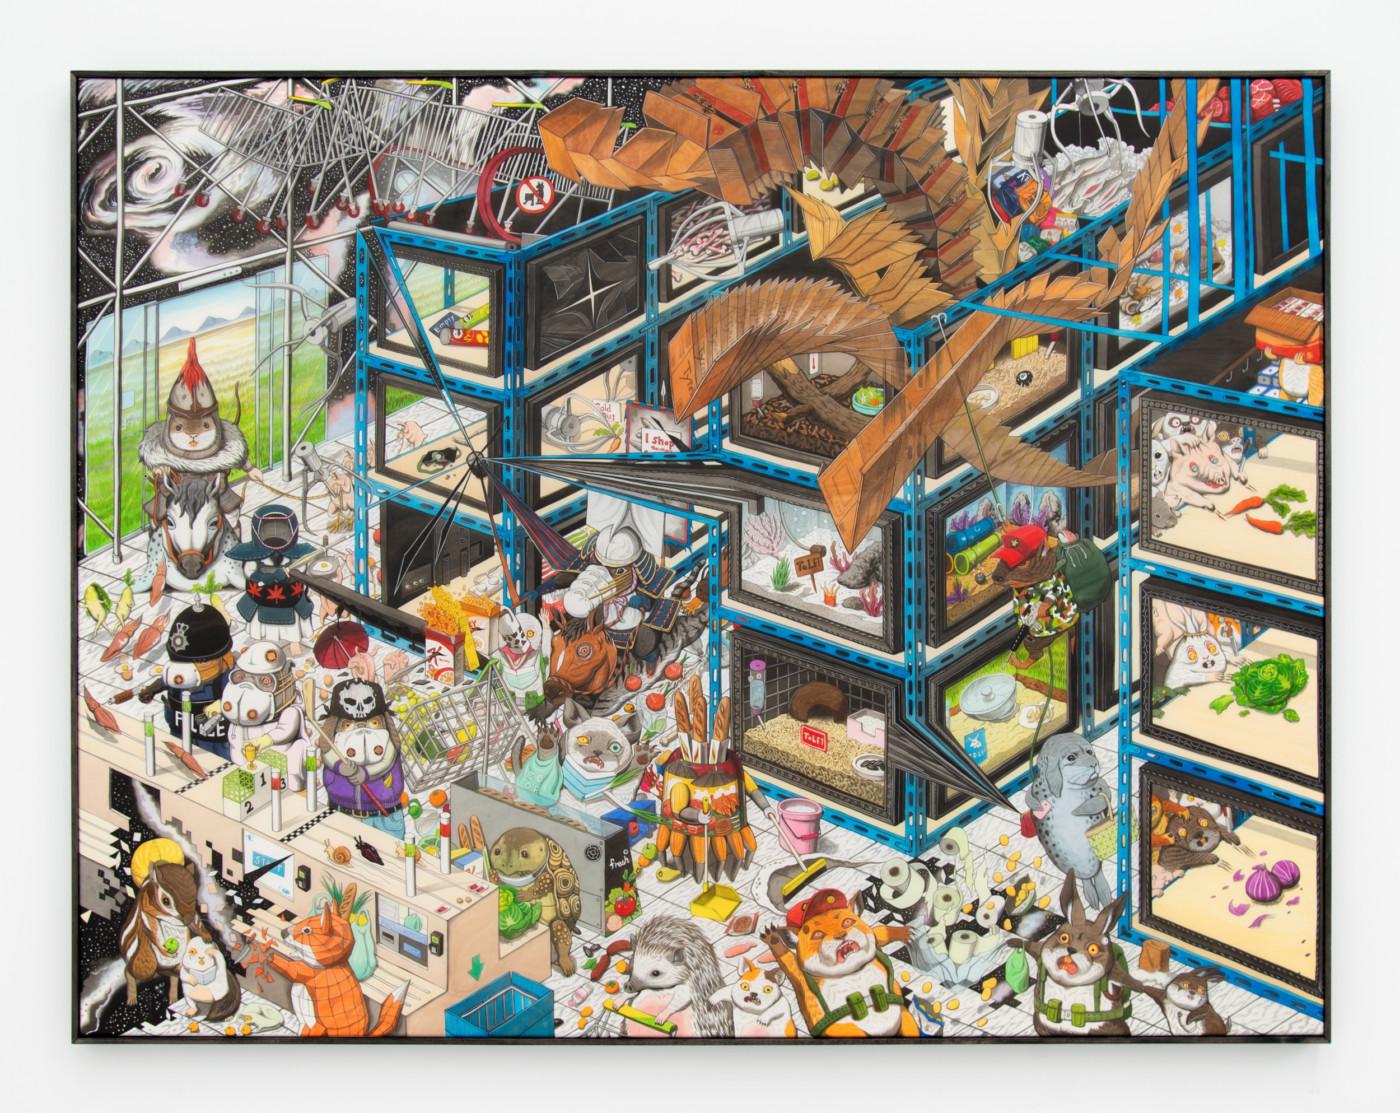 HUN KYU KIM Readymade Flea Market, 2020 Pigment painted on silk 101 x 131 cm / 39 3/4 x 51 5/8 in - High Art Gallery Paris